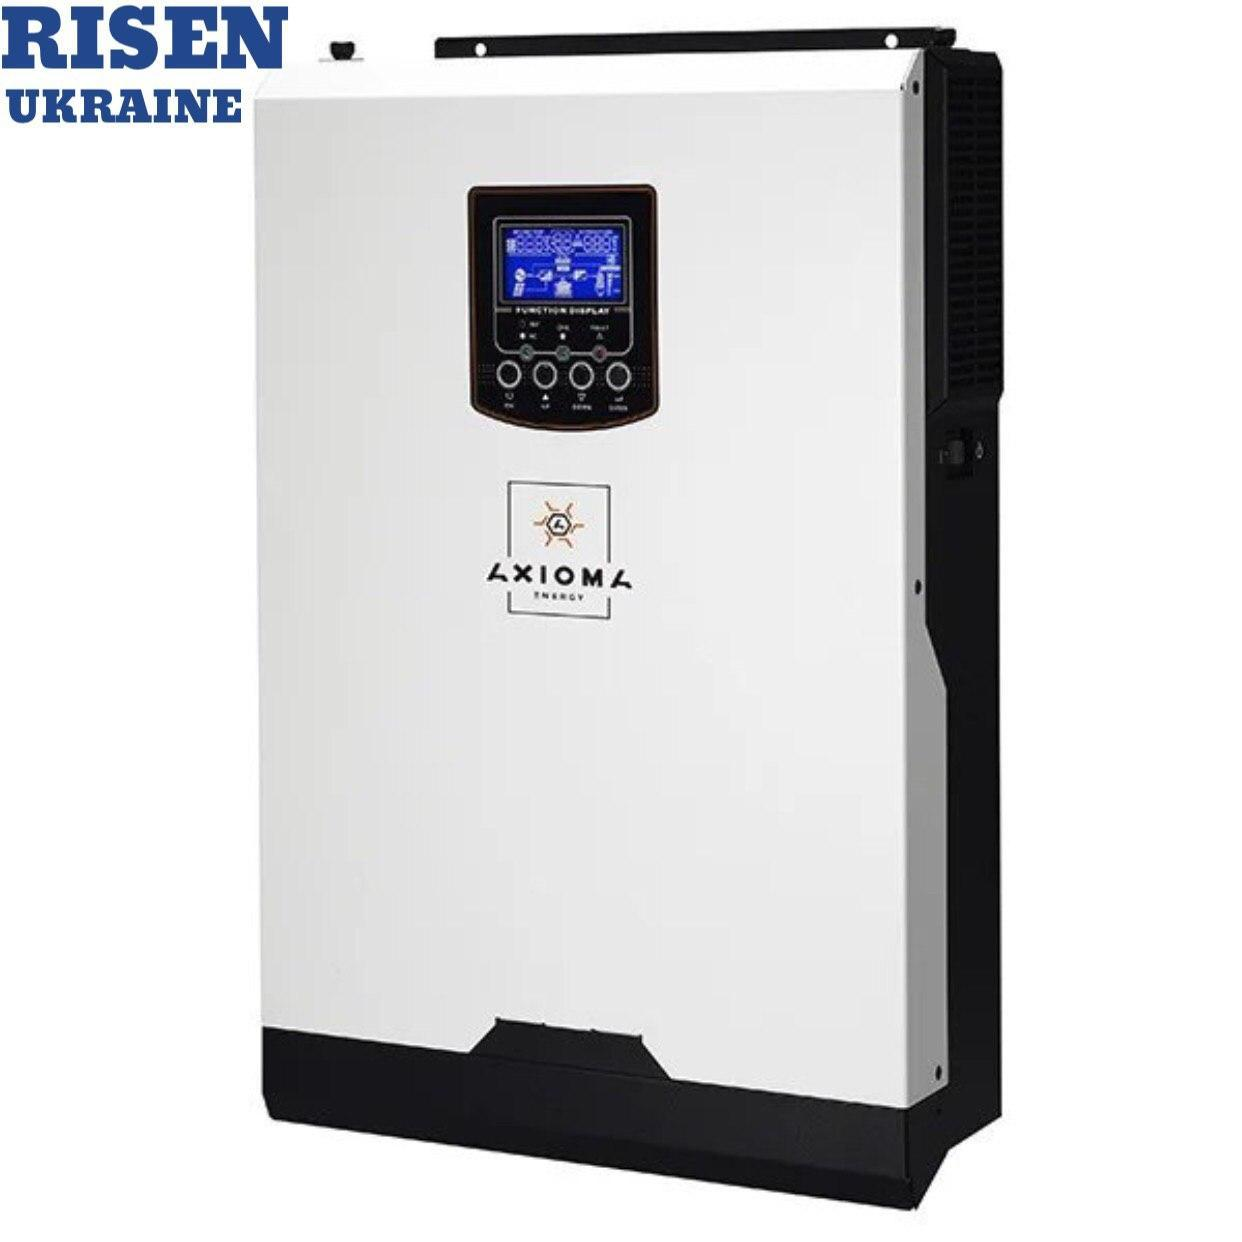 AXIOMA BF 5000 гибридный ИБП48В, инвертор + МППТ контроллер 80А, ISMPPT BF (Battery Free) 5000